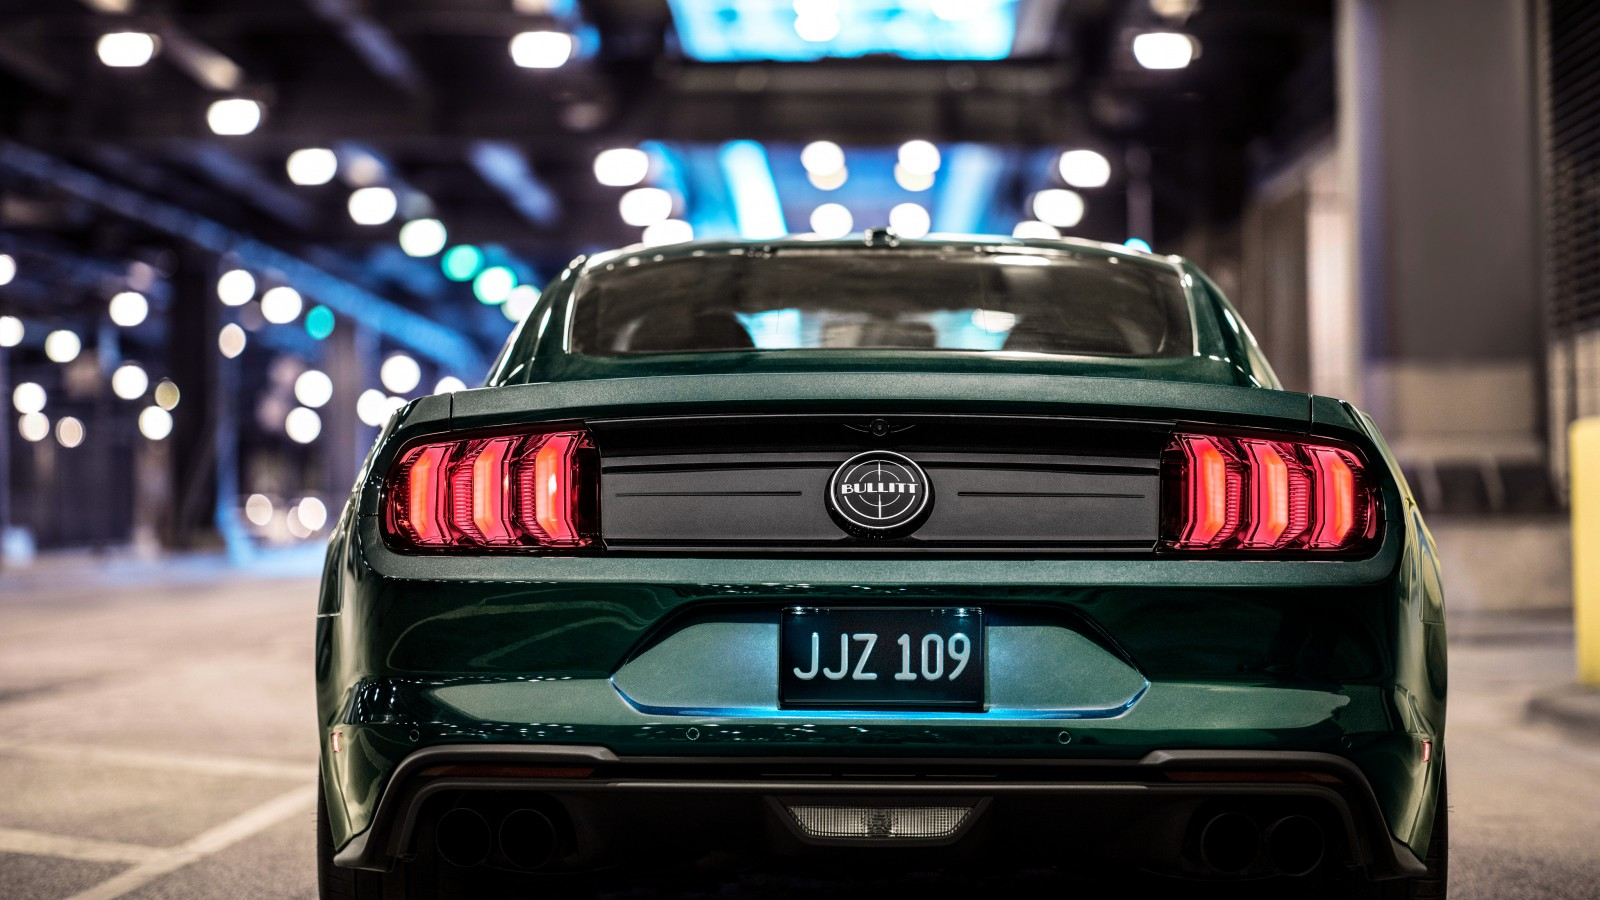 Shelby Cobra F150 >> 2018 Ford Mustang Bullitt 4K 2 Wallpaper | HD Car Wallpapers | ID #10082